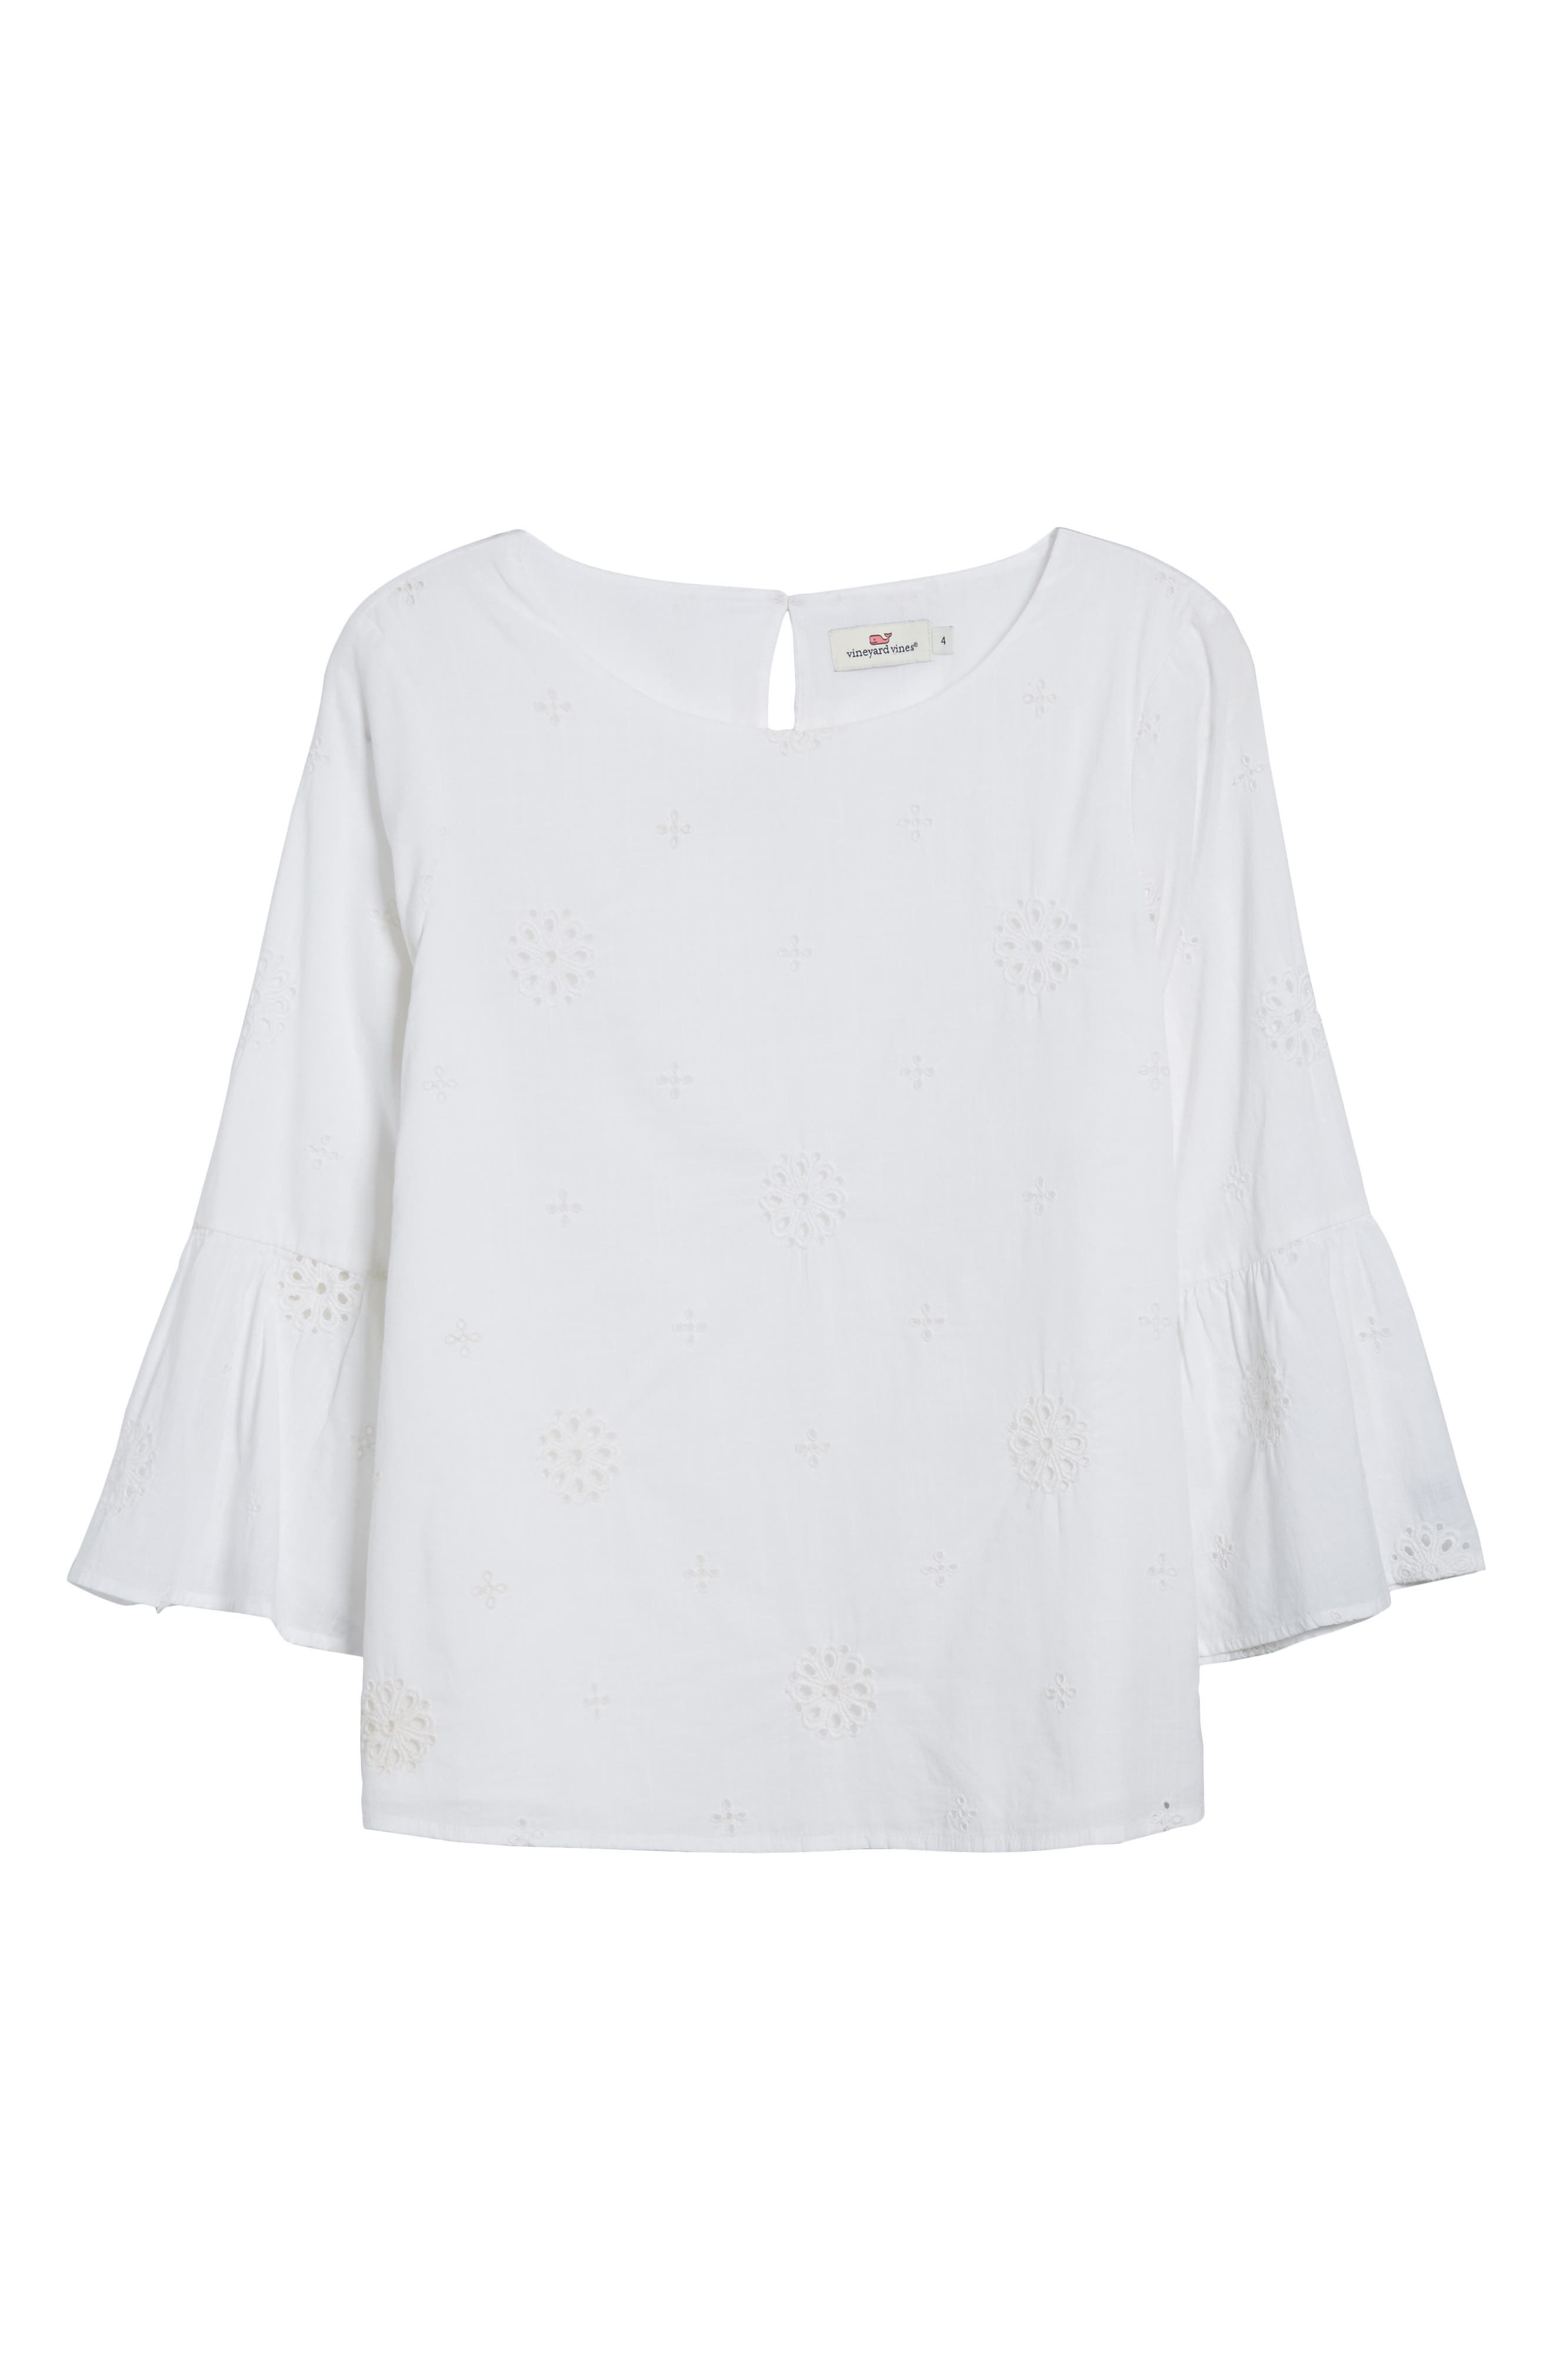 Eyelet Bell Sleeve Cotton Top,                             Alternate thumbnail 6, color,                             White Cap